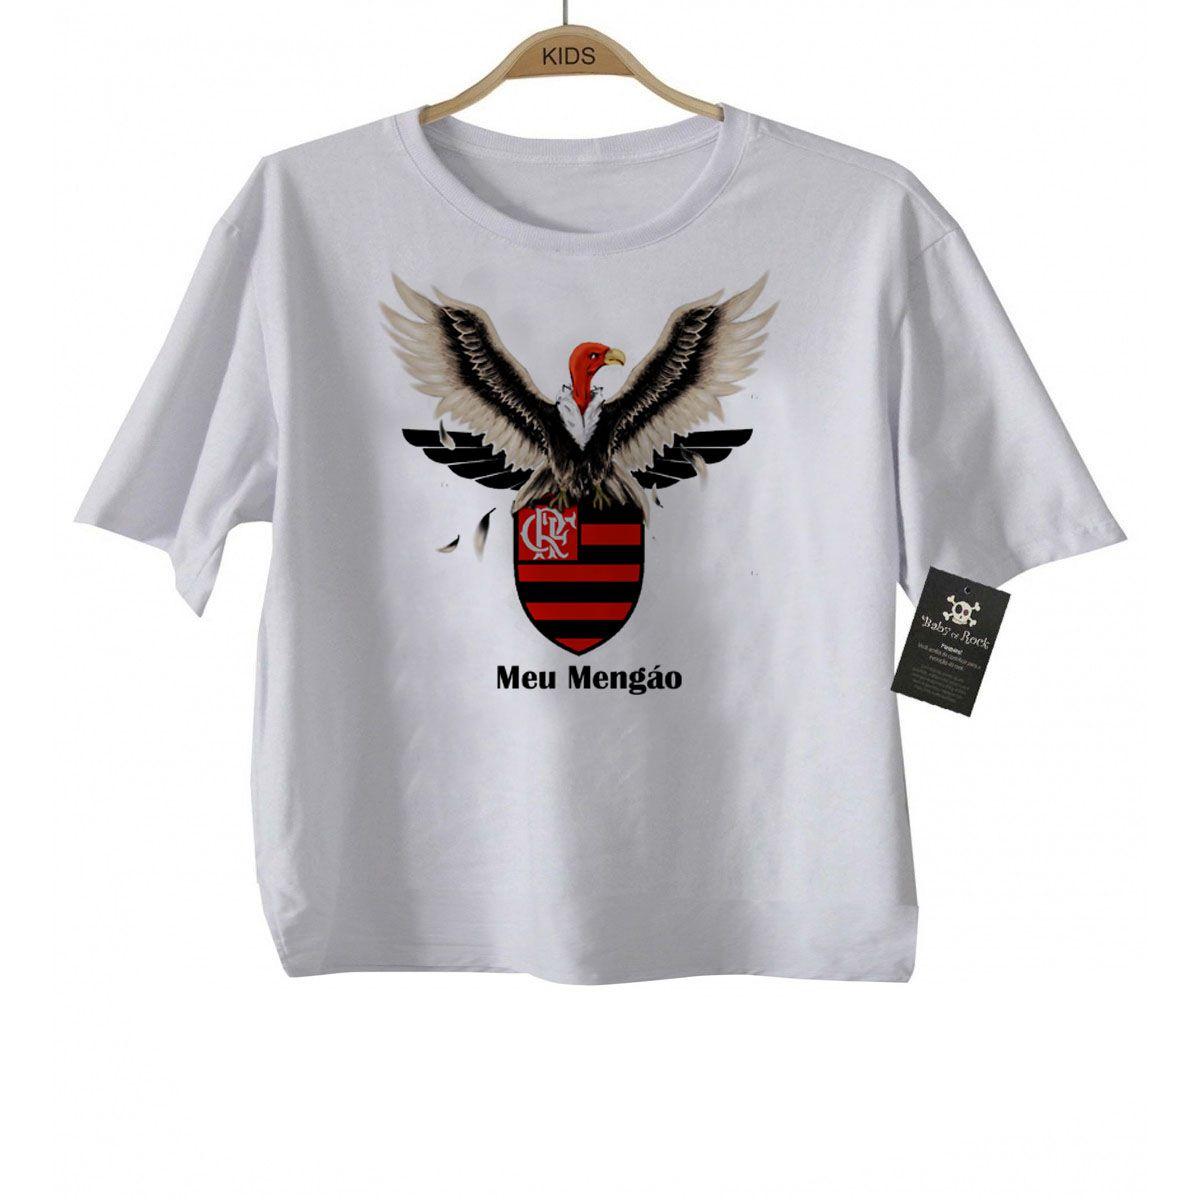 Camiseta Infantil Flamengo Futebol Time - White  - Baby Monster S/A